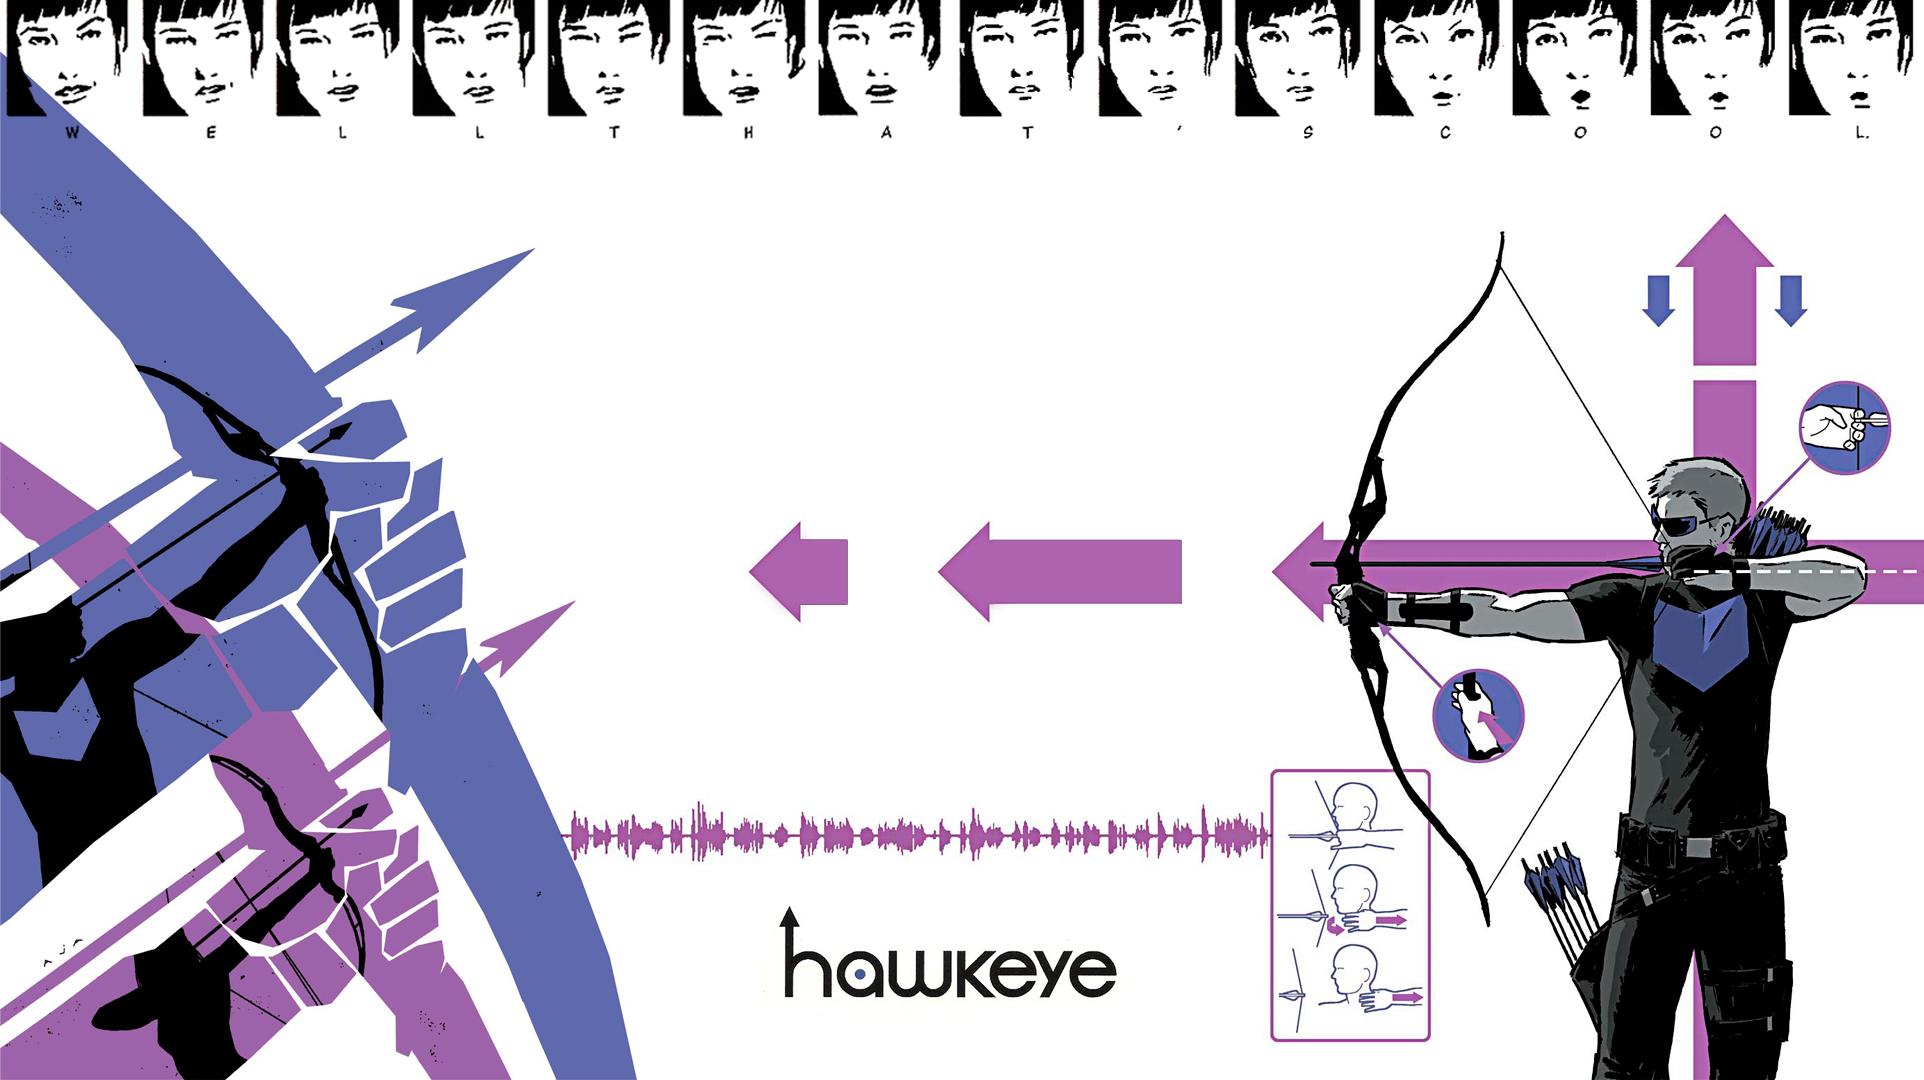 Hawkeye Computer Wallpapers Desktop Backgrounds 1924x1080 ID 1924x1080